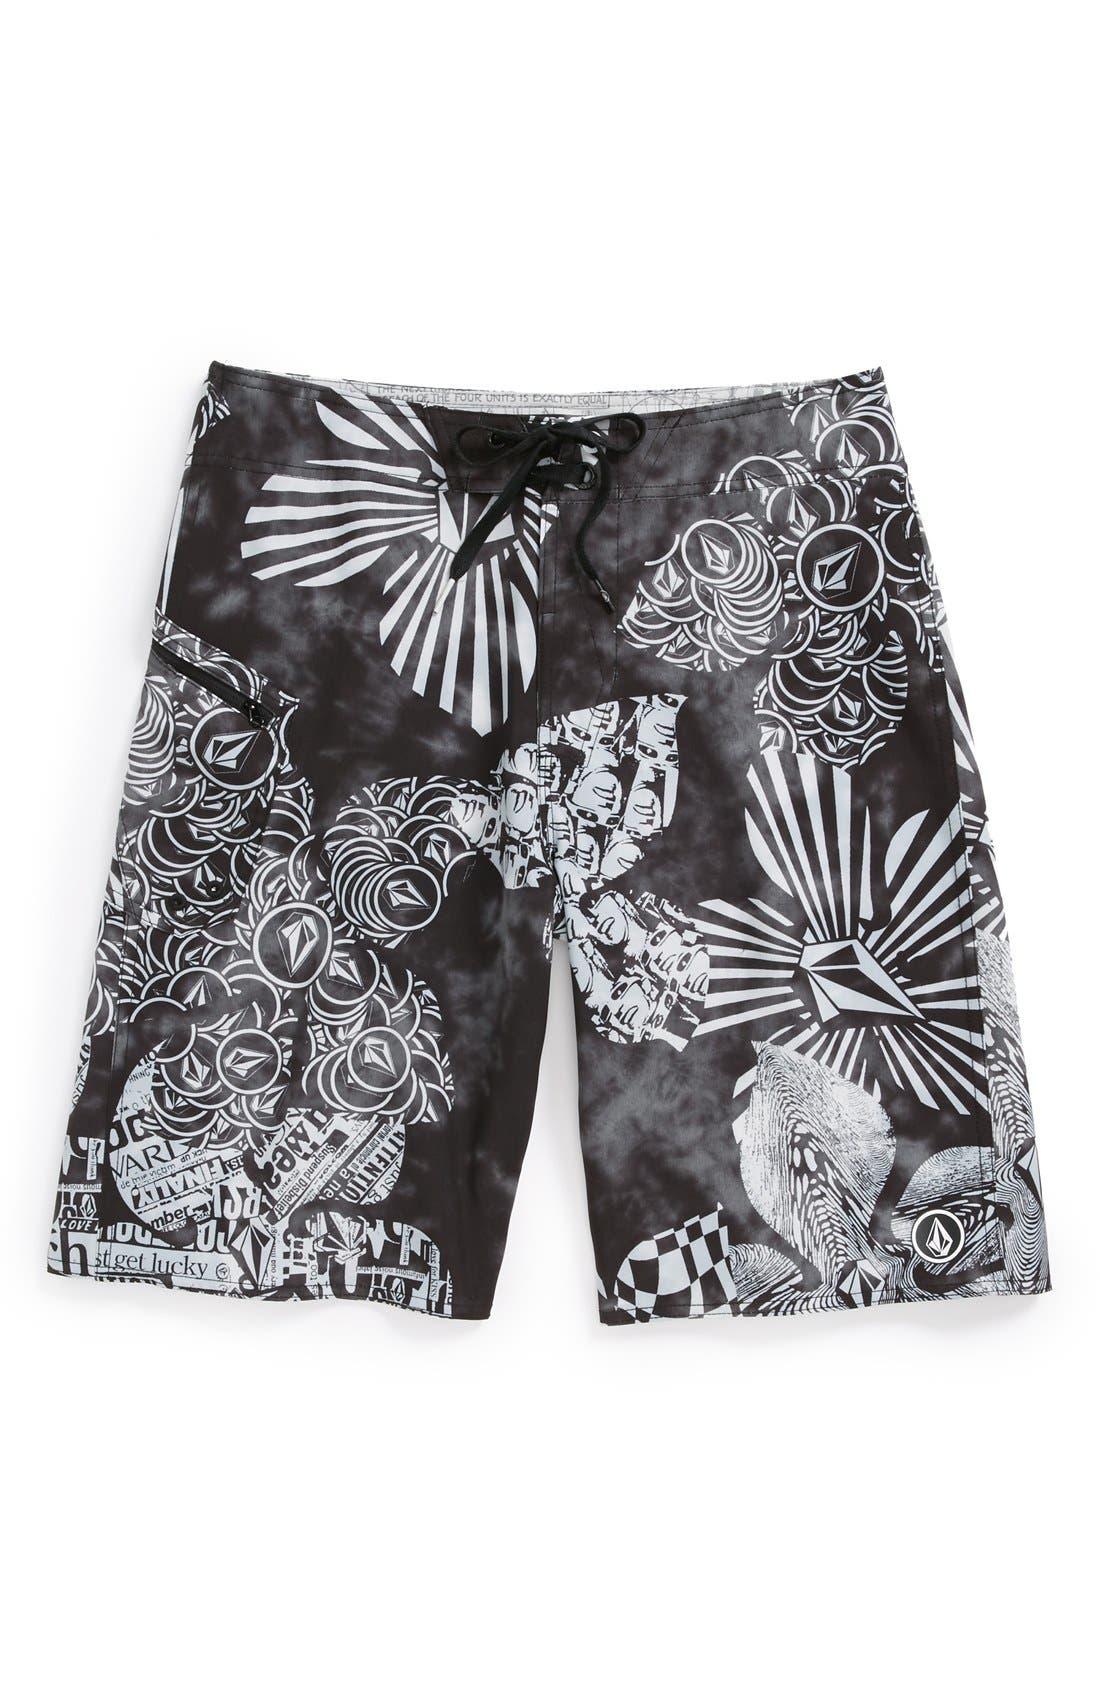 Alternate Image 1 Selected - Volcom 'Lido Weedo' Board Shorts (Little Boys & Big Boys)